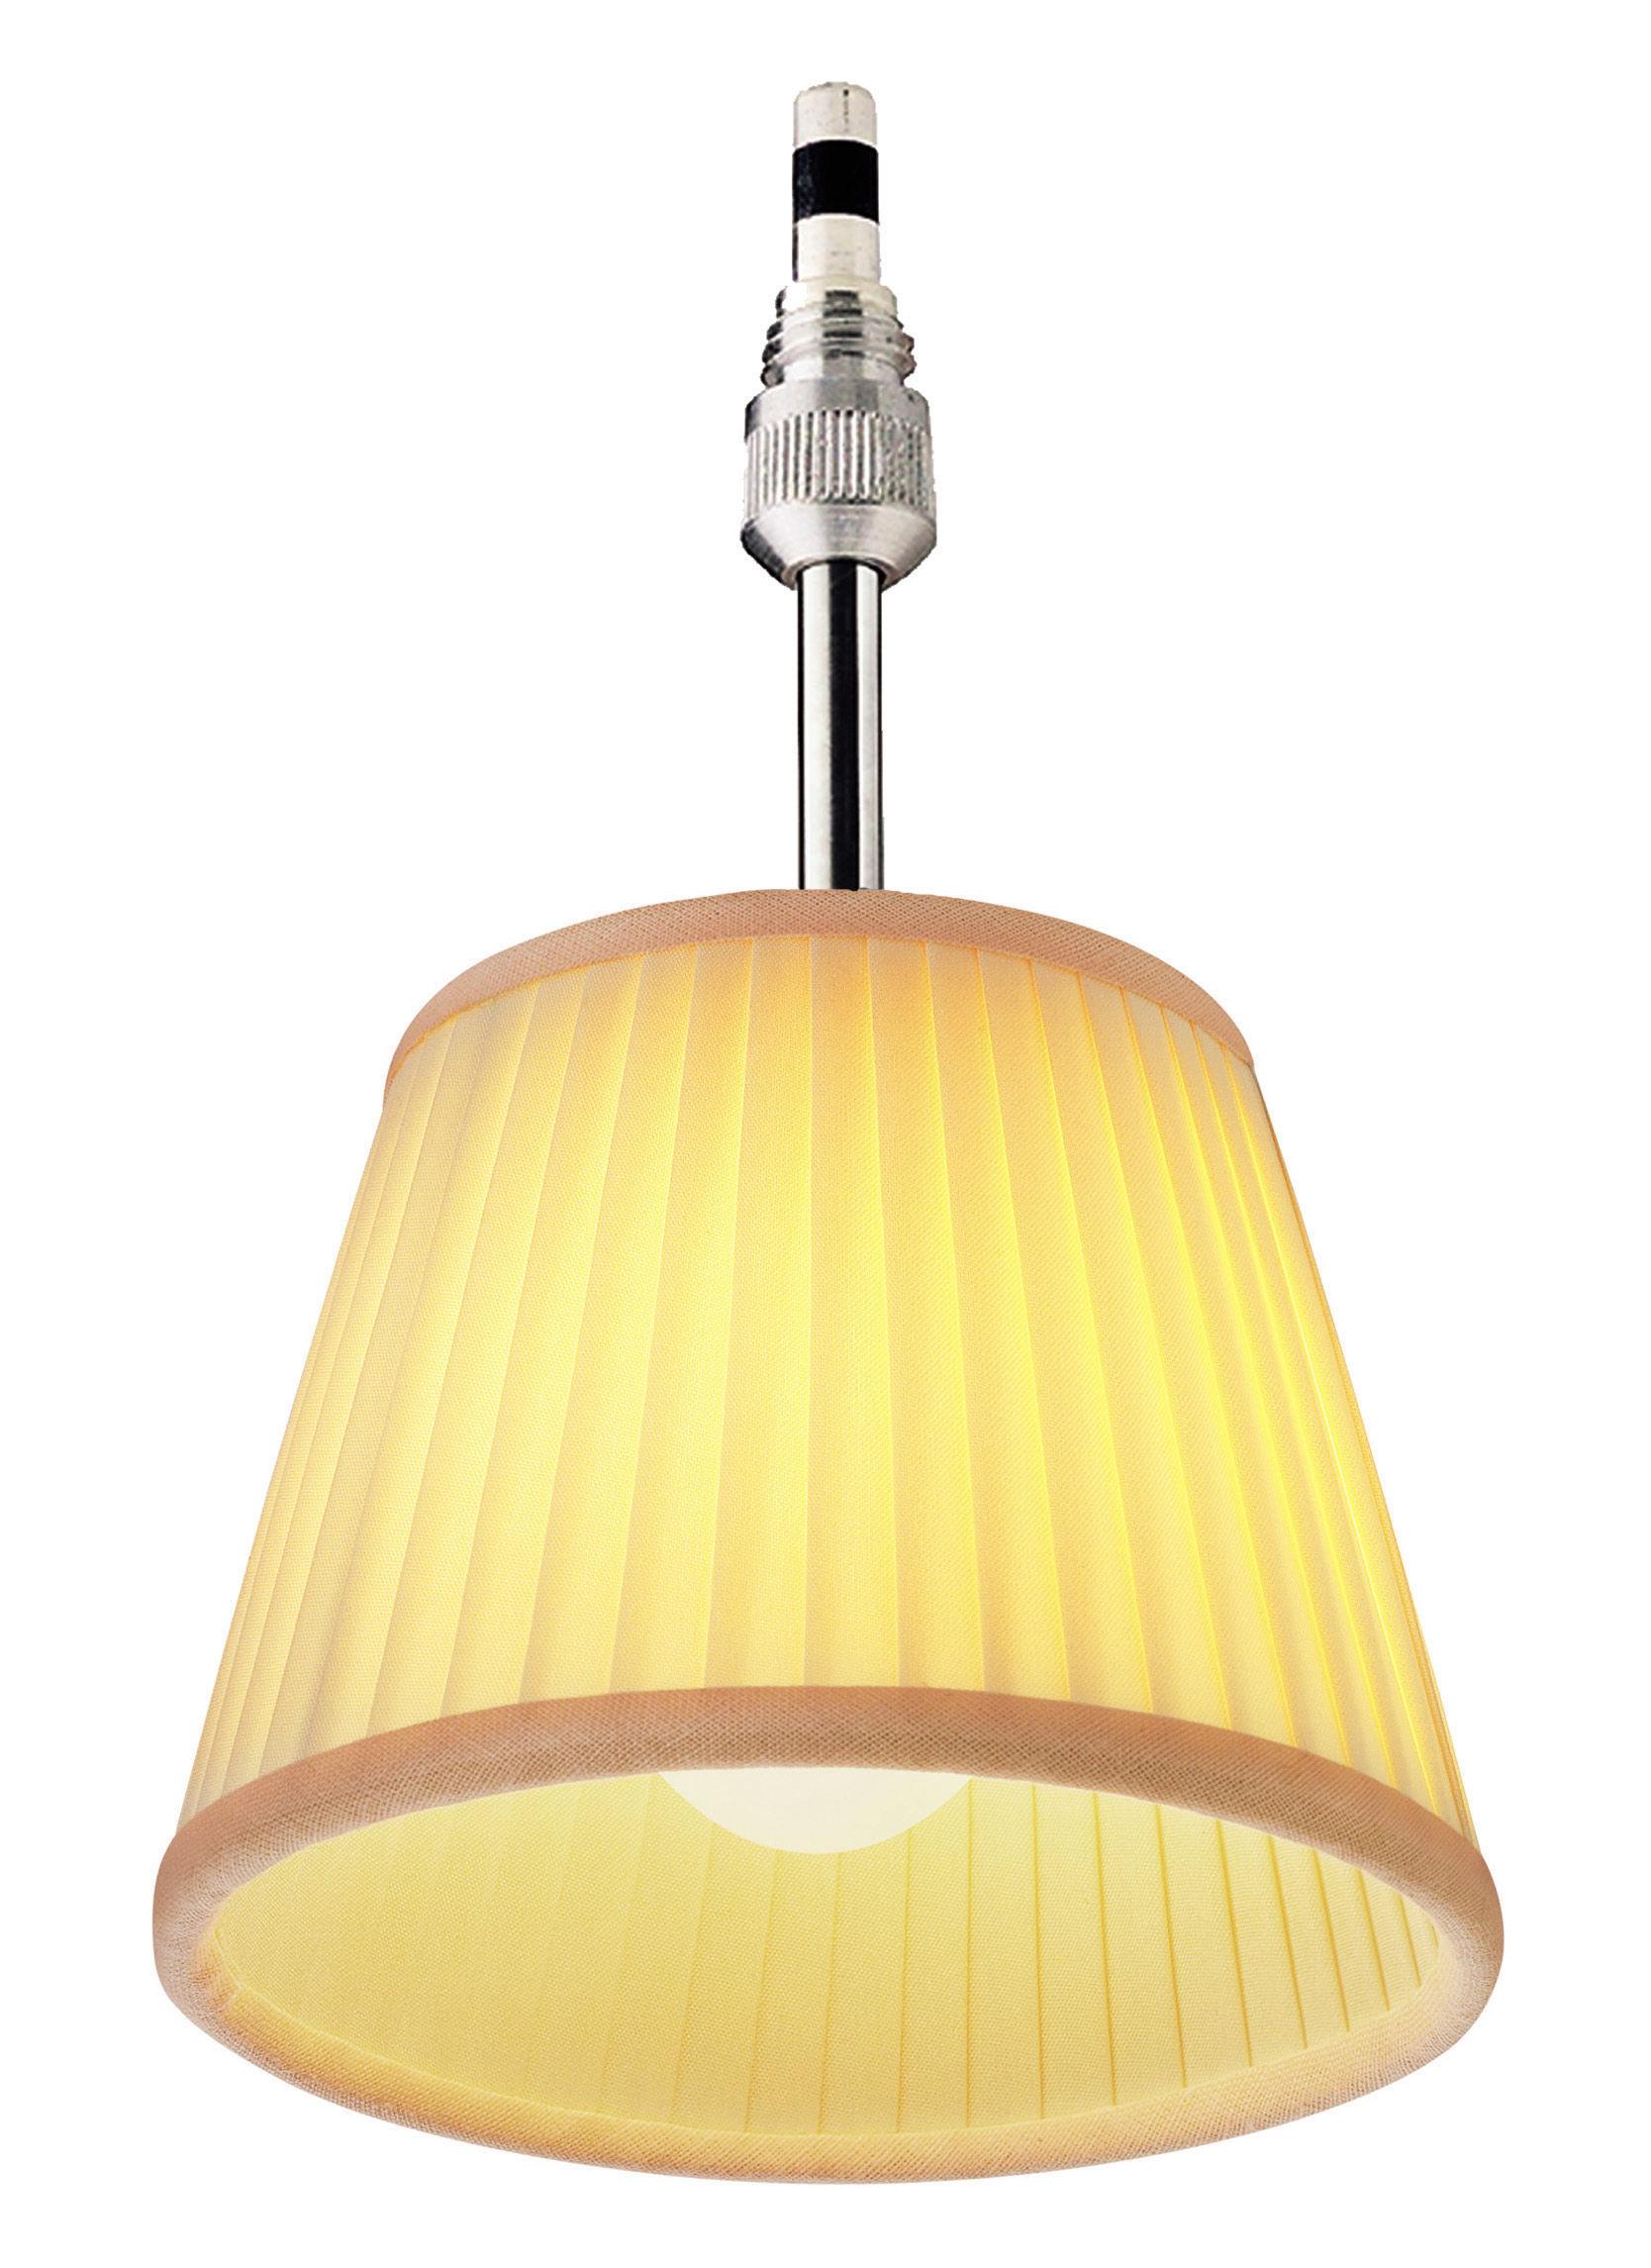 Lighting - Pendant Lighting - Romeo Babe Soft Pendant by Flos - Cream coloured texture - Fabric